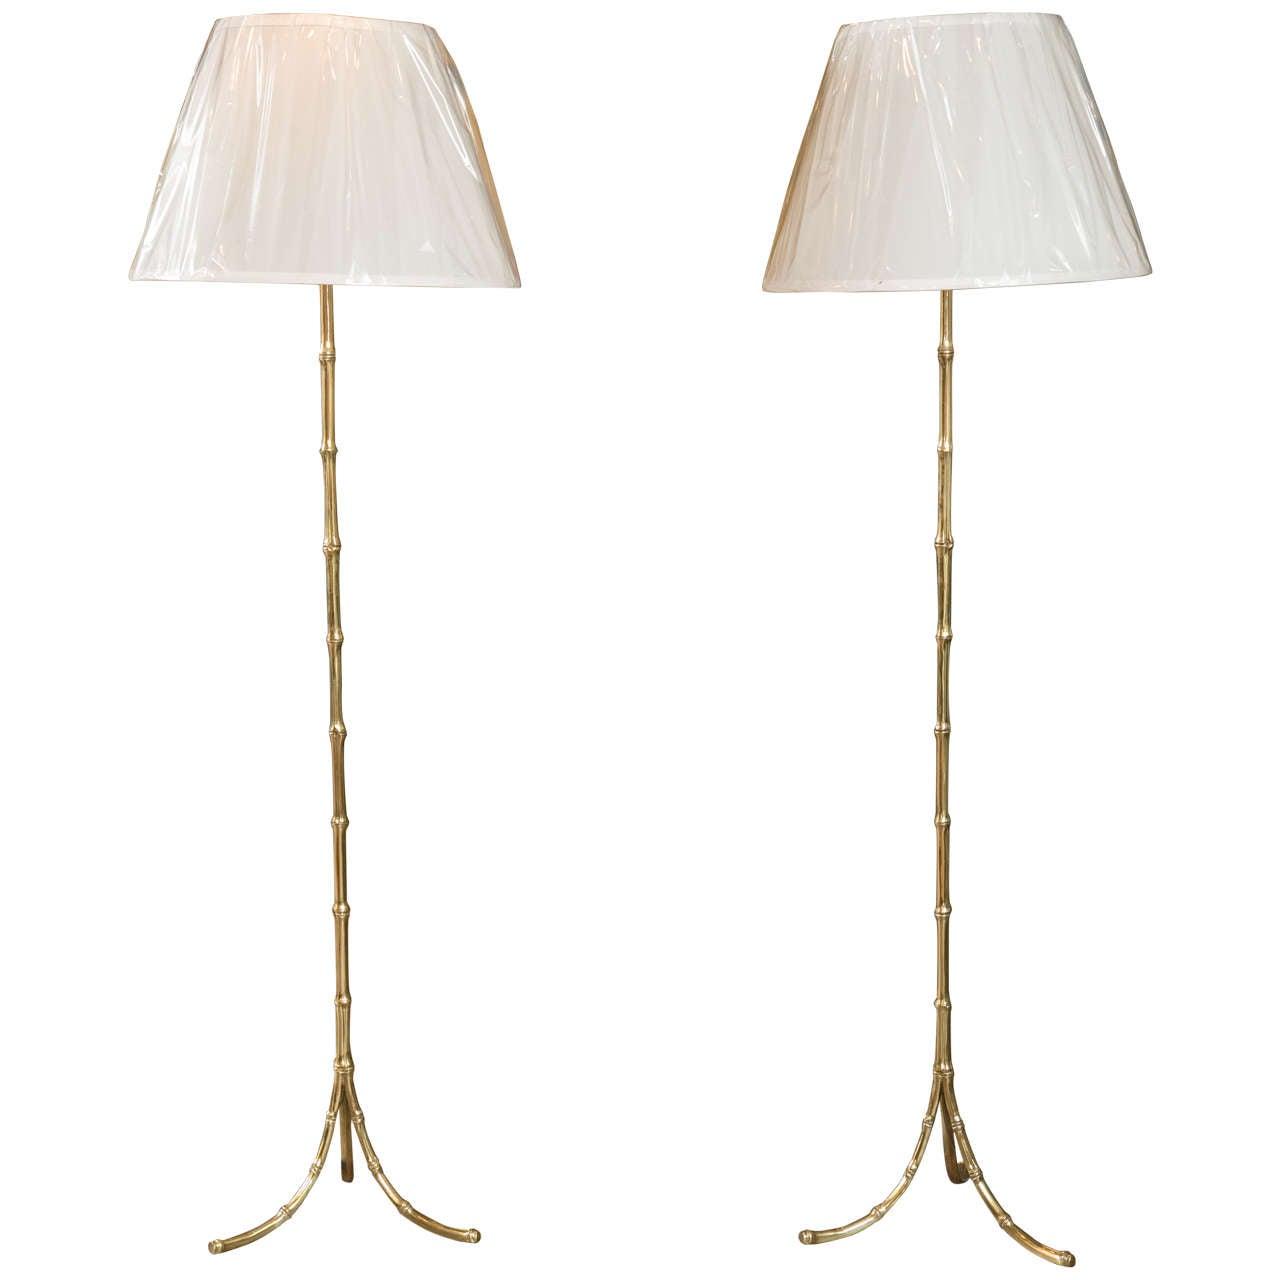 Pair of Bronze Faux Bamboo Floor Lamps